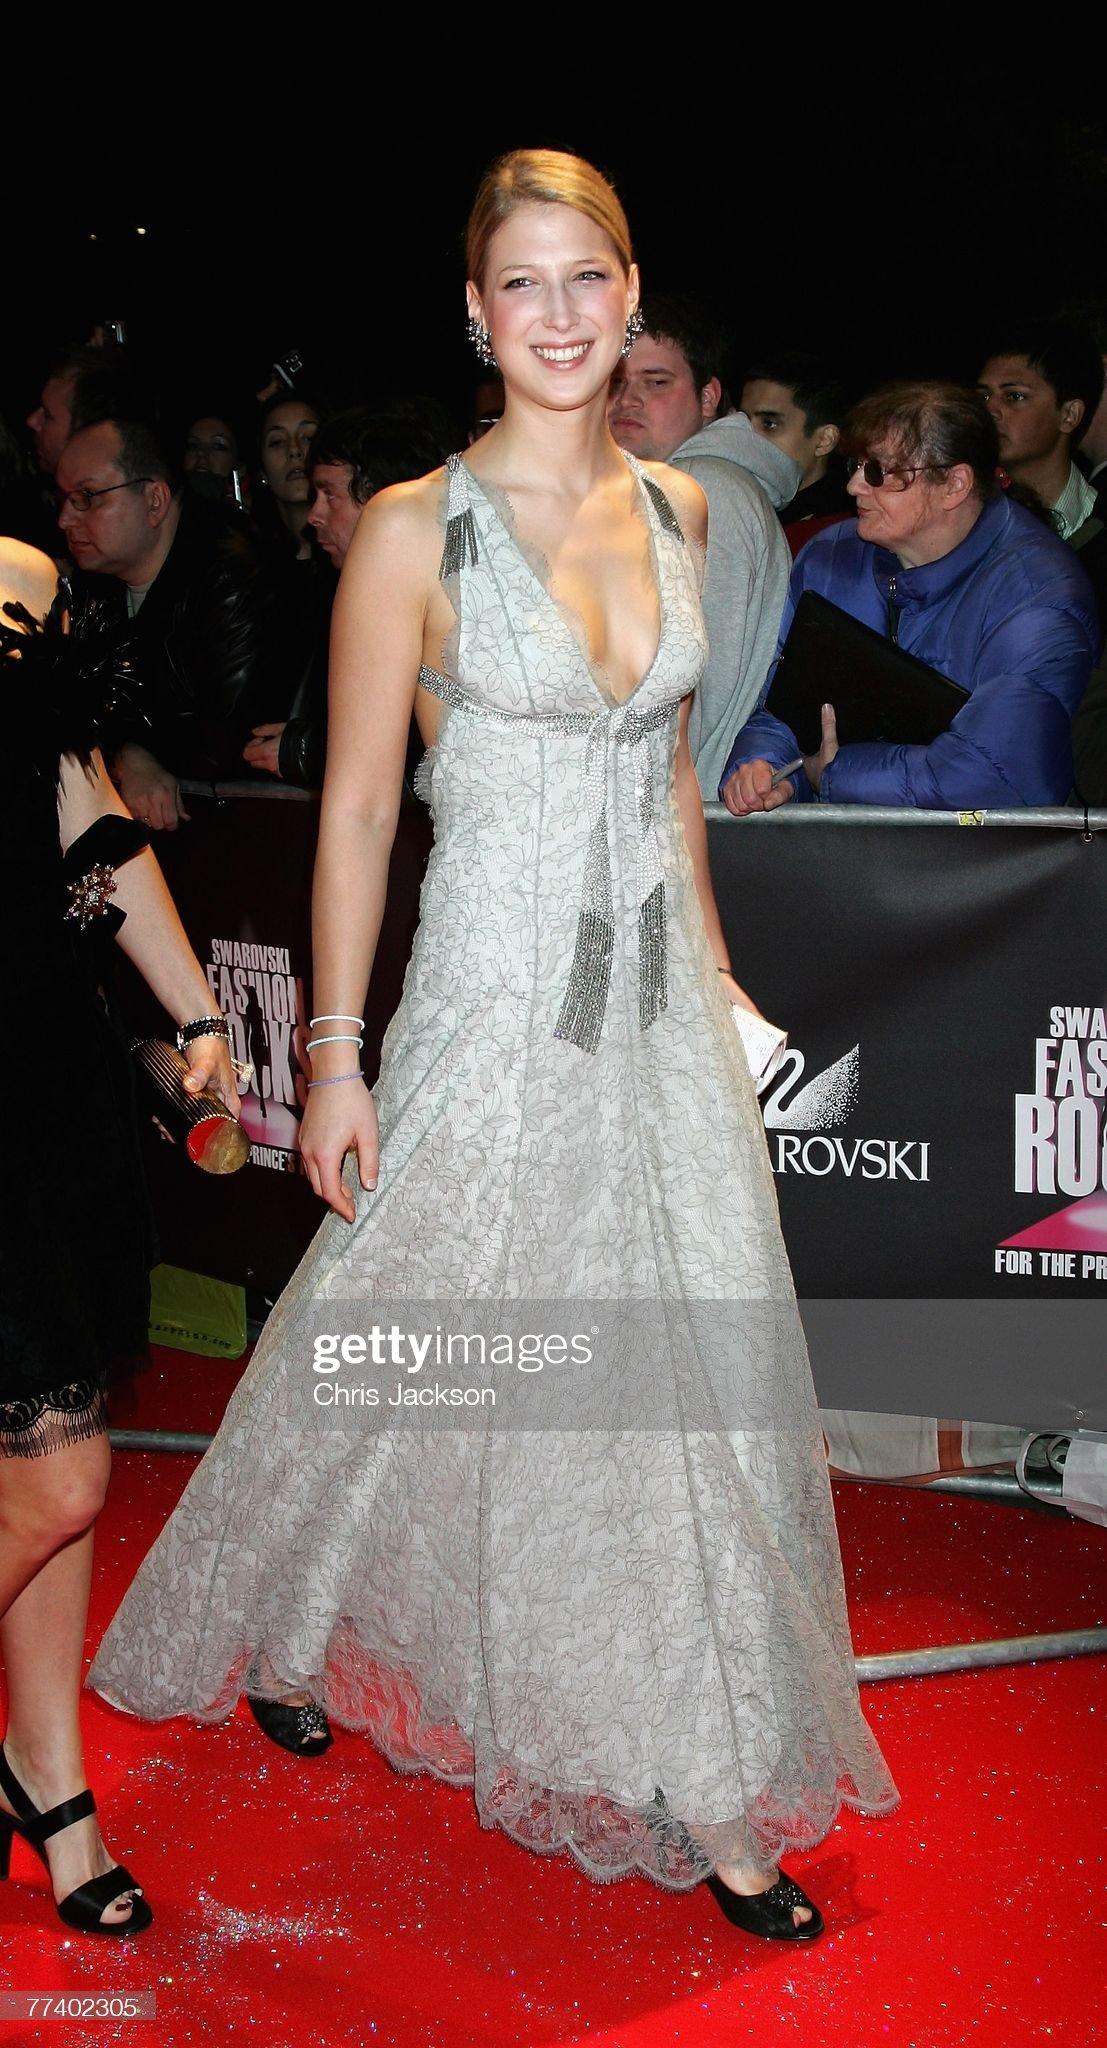 Swarovski Fashion Rocks - Arrivals : News Photo